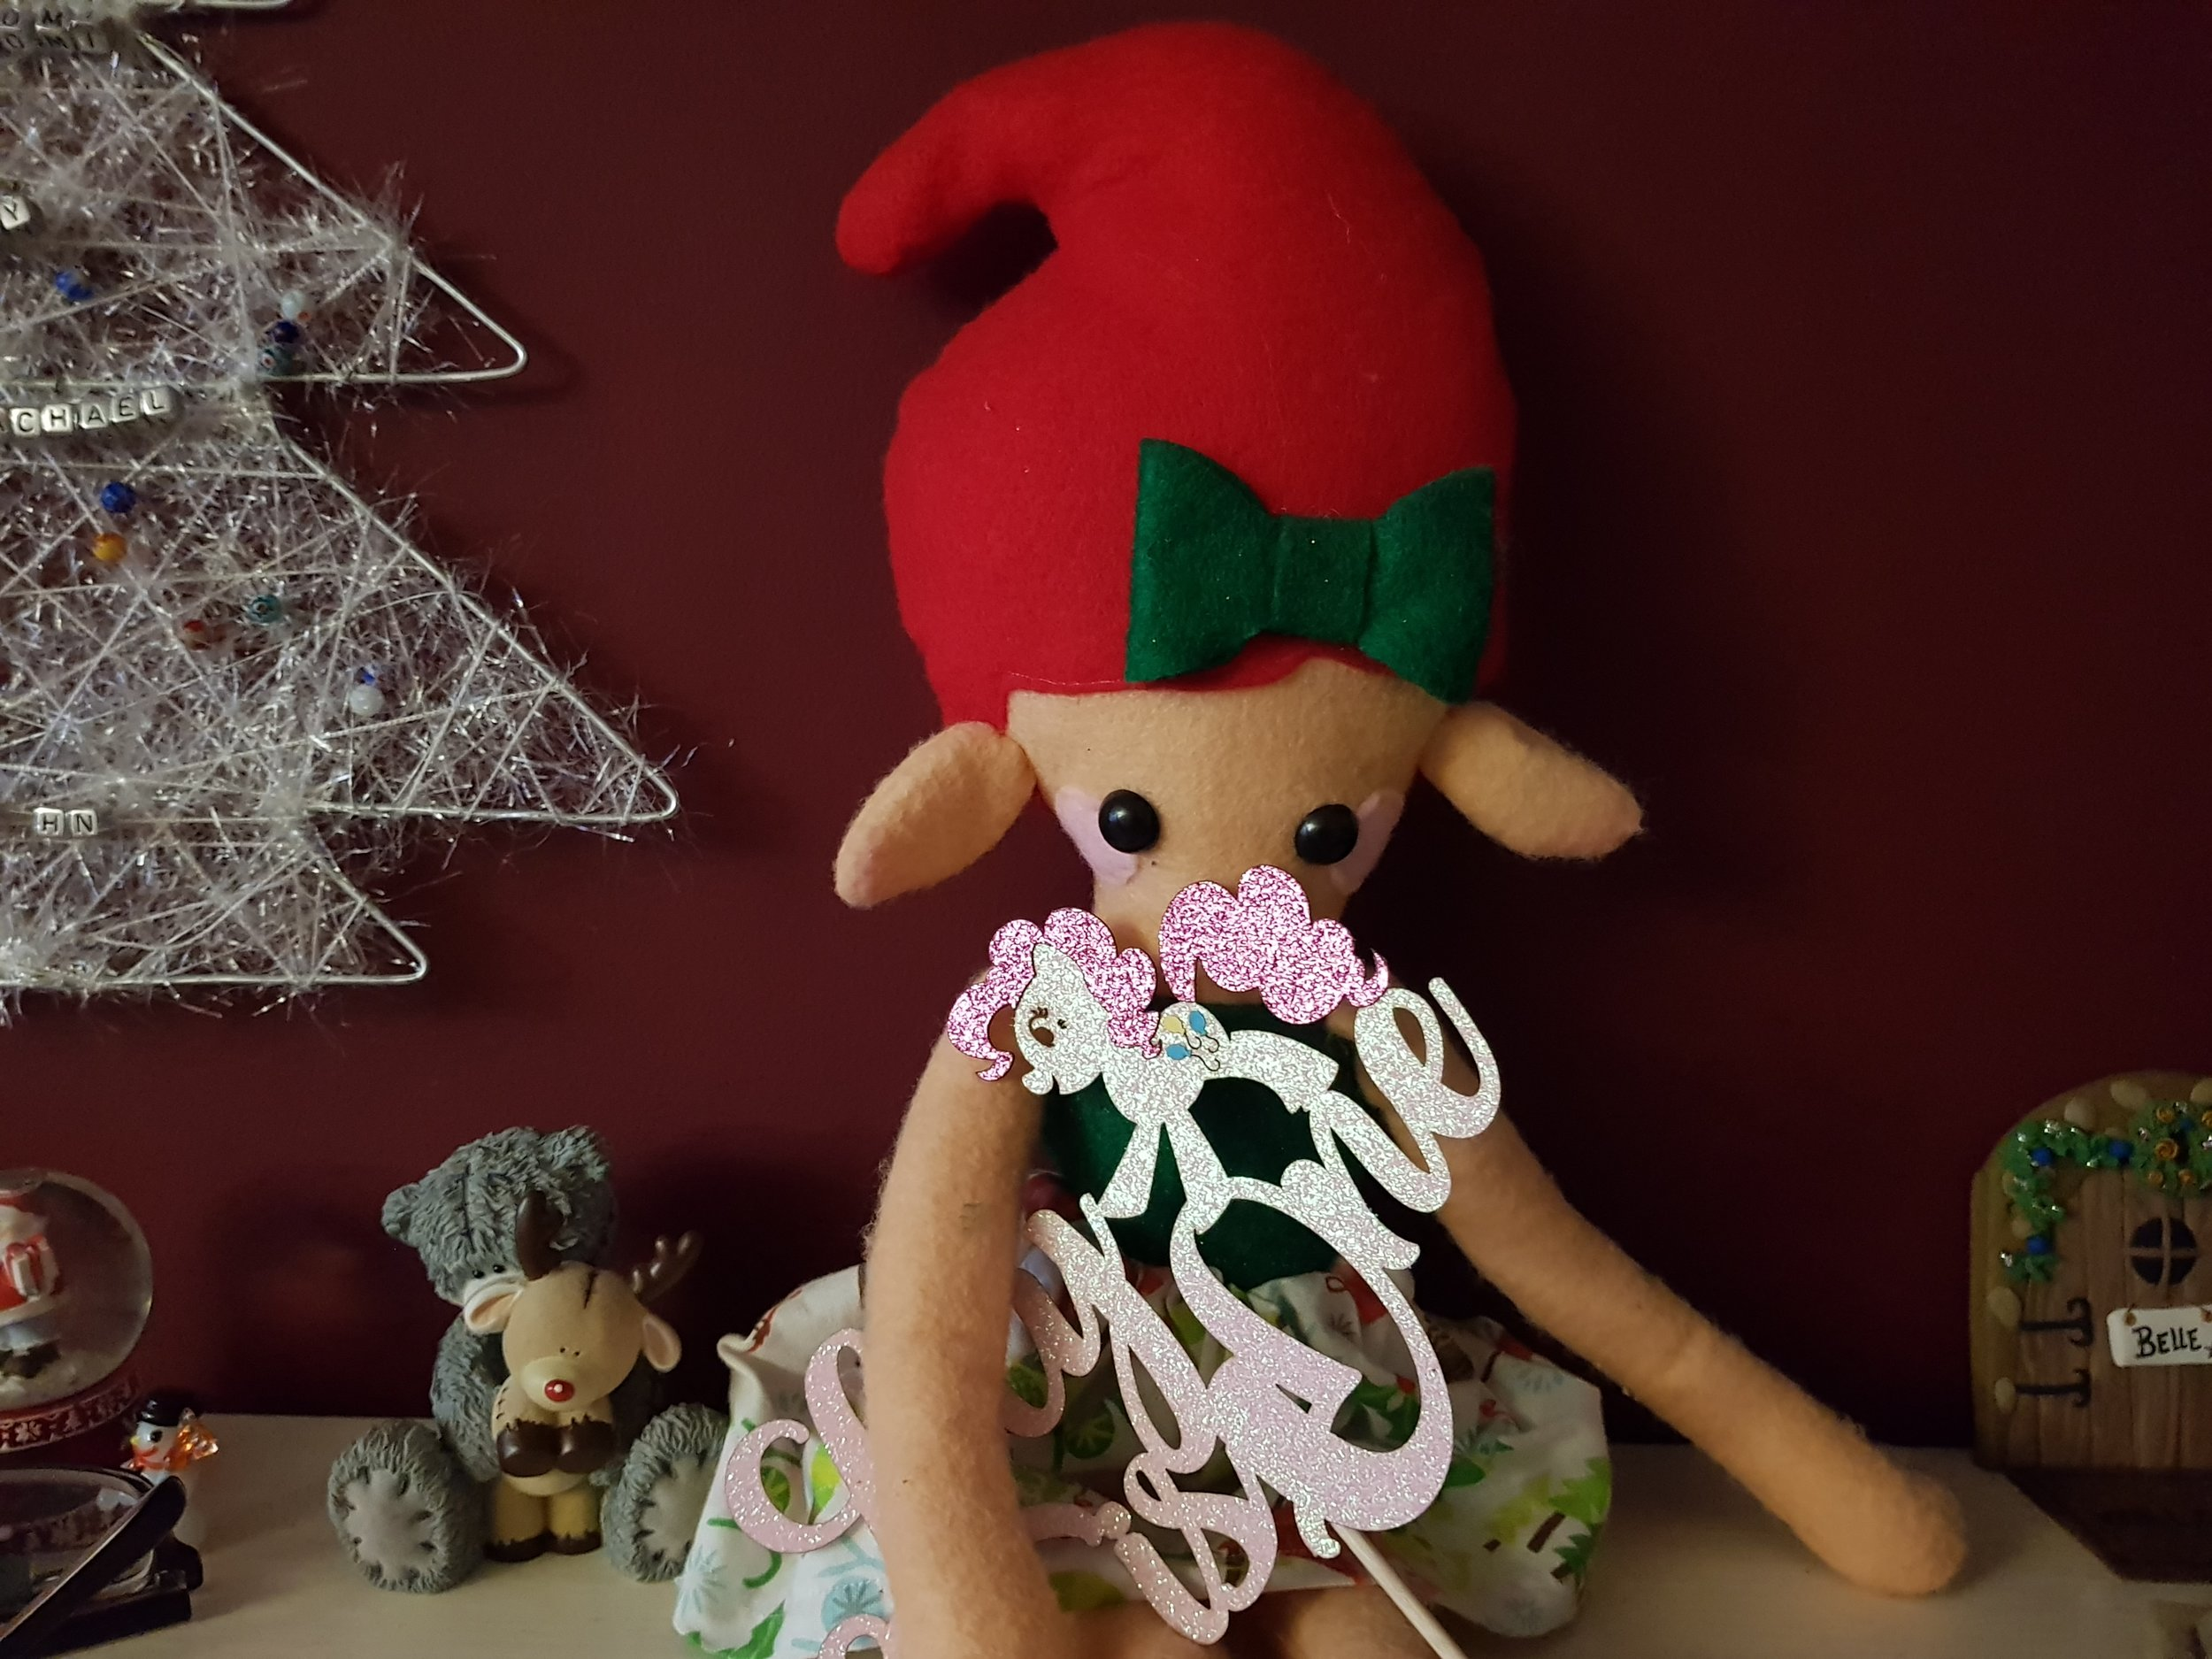 Elf on a Shelf December 17th Birthday Party